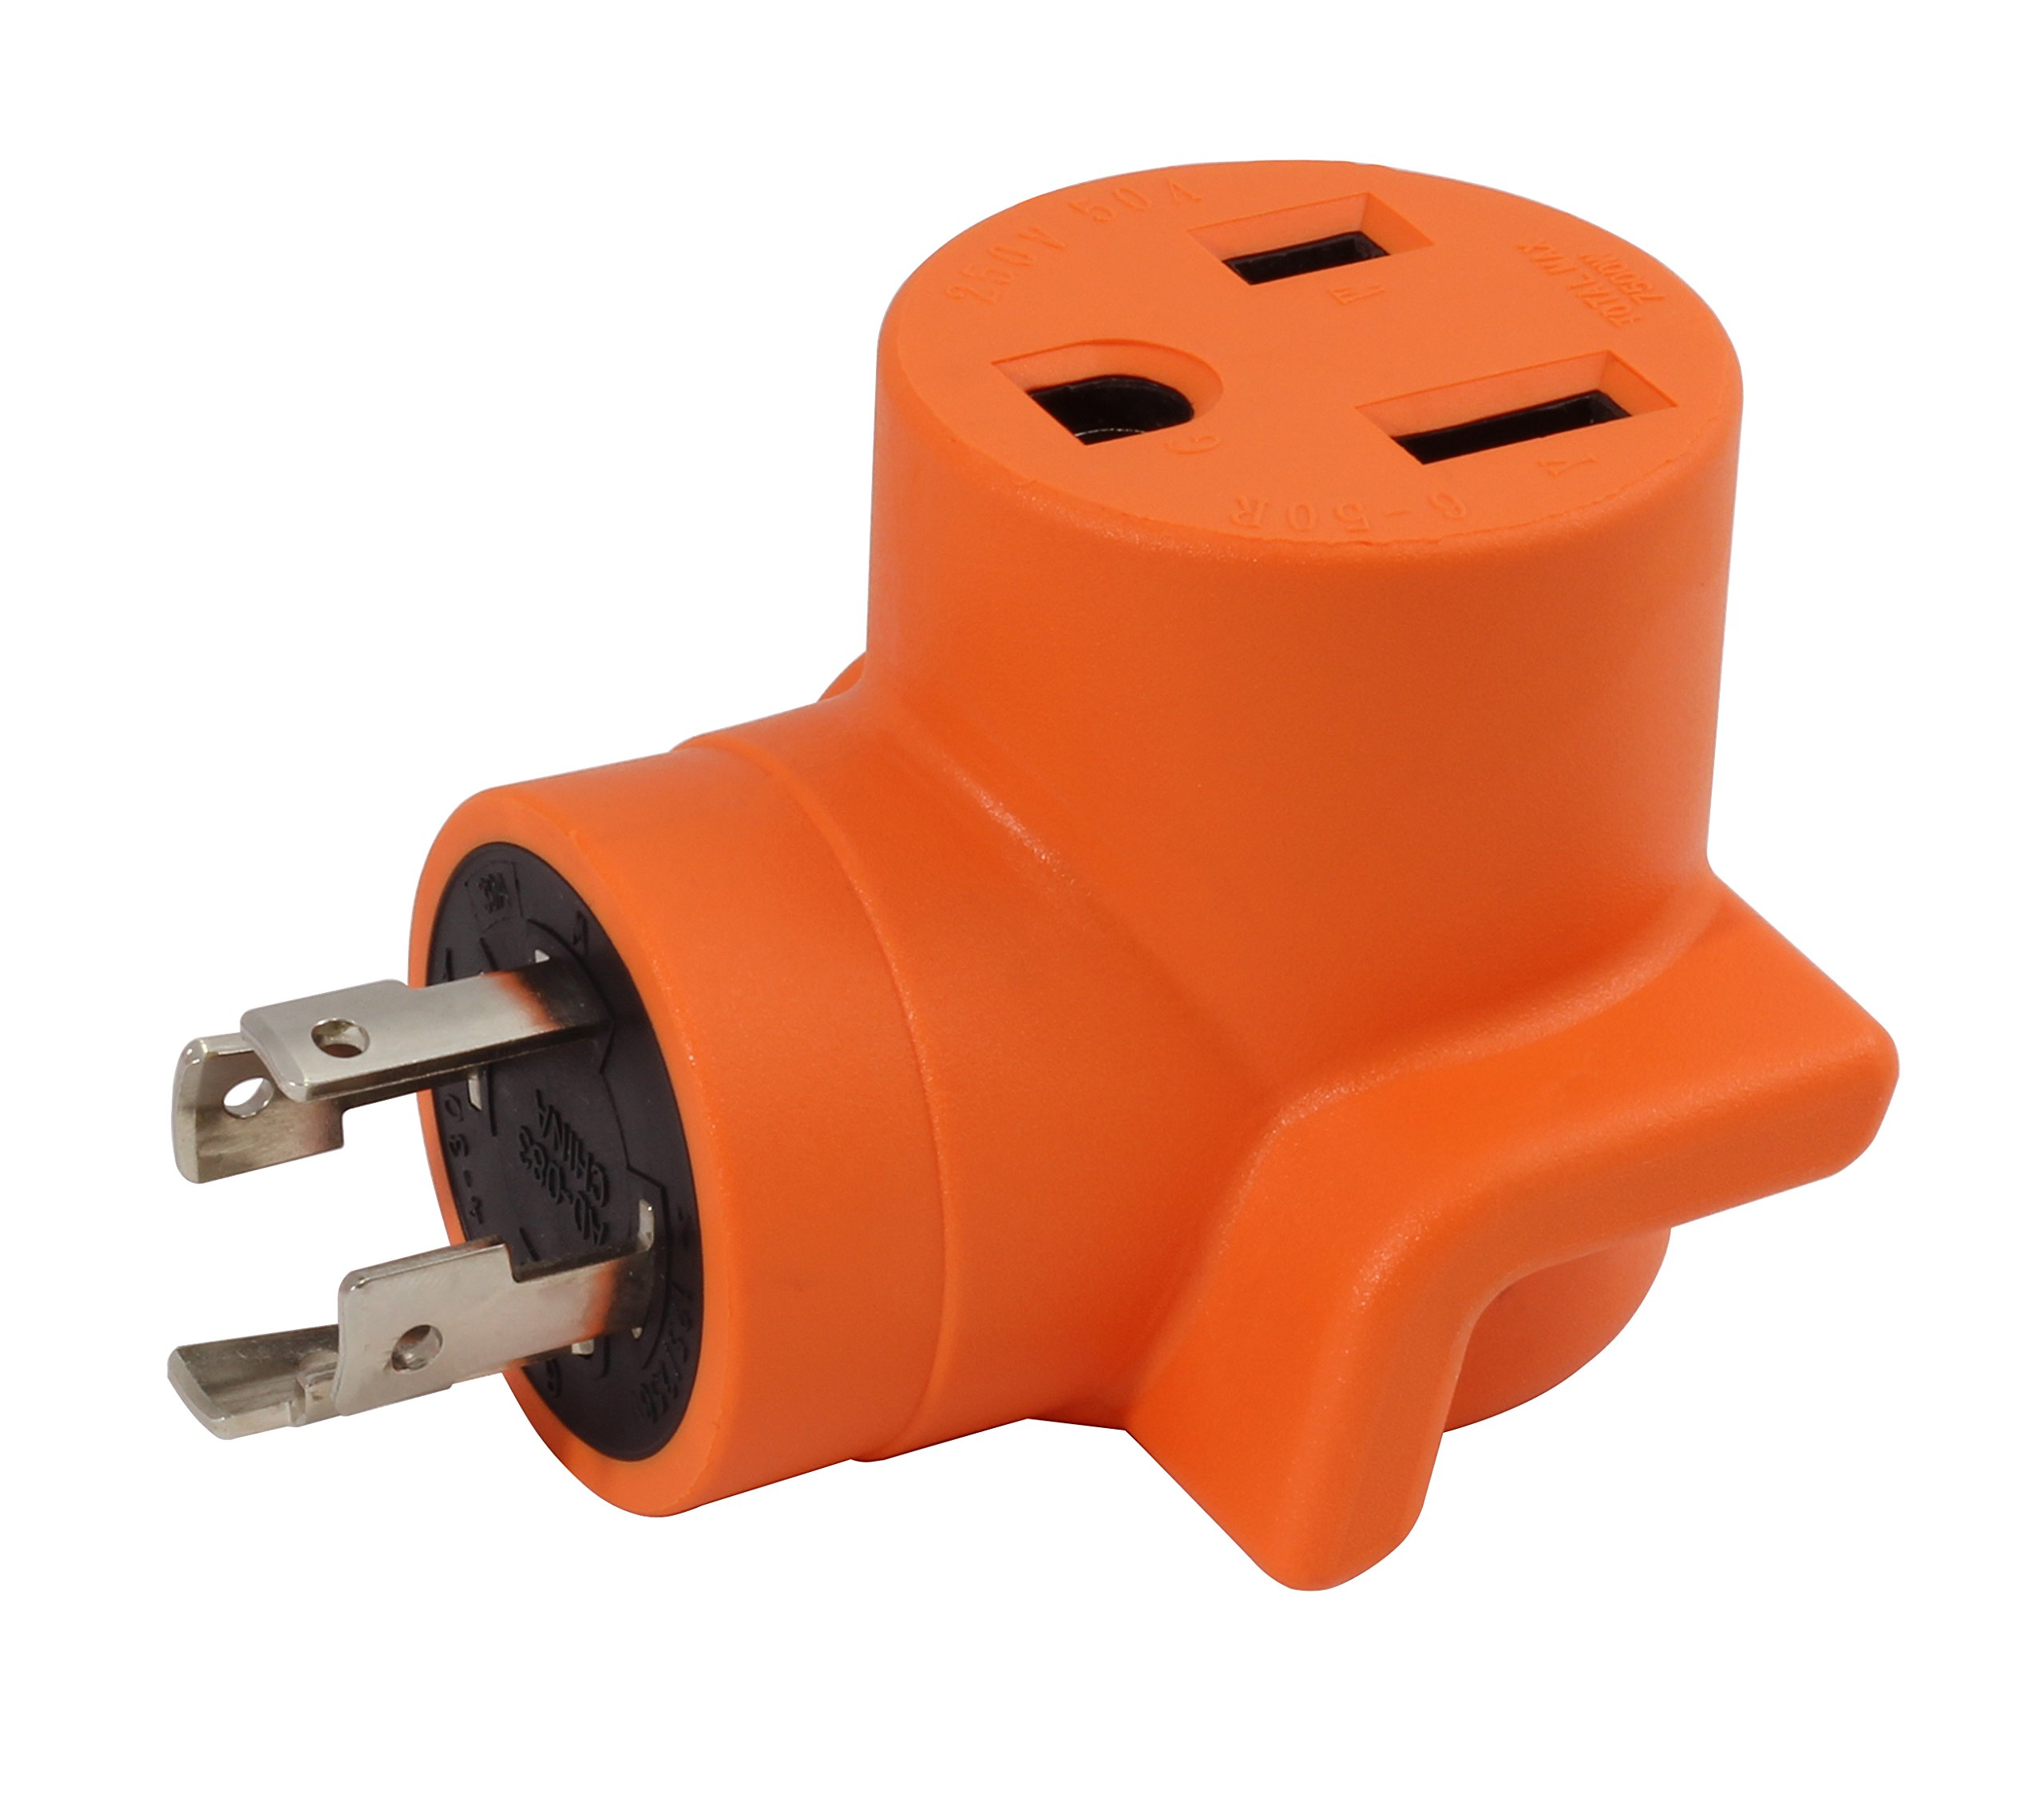 AC WORKS [WDL1430650] 30Amp 4-Prong L14-30P Generator Locking Plug to 6-50R 50Amp 250V Welder adapter